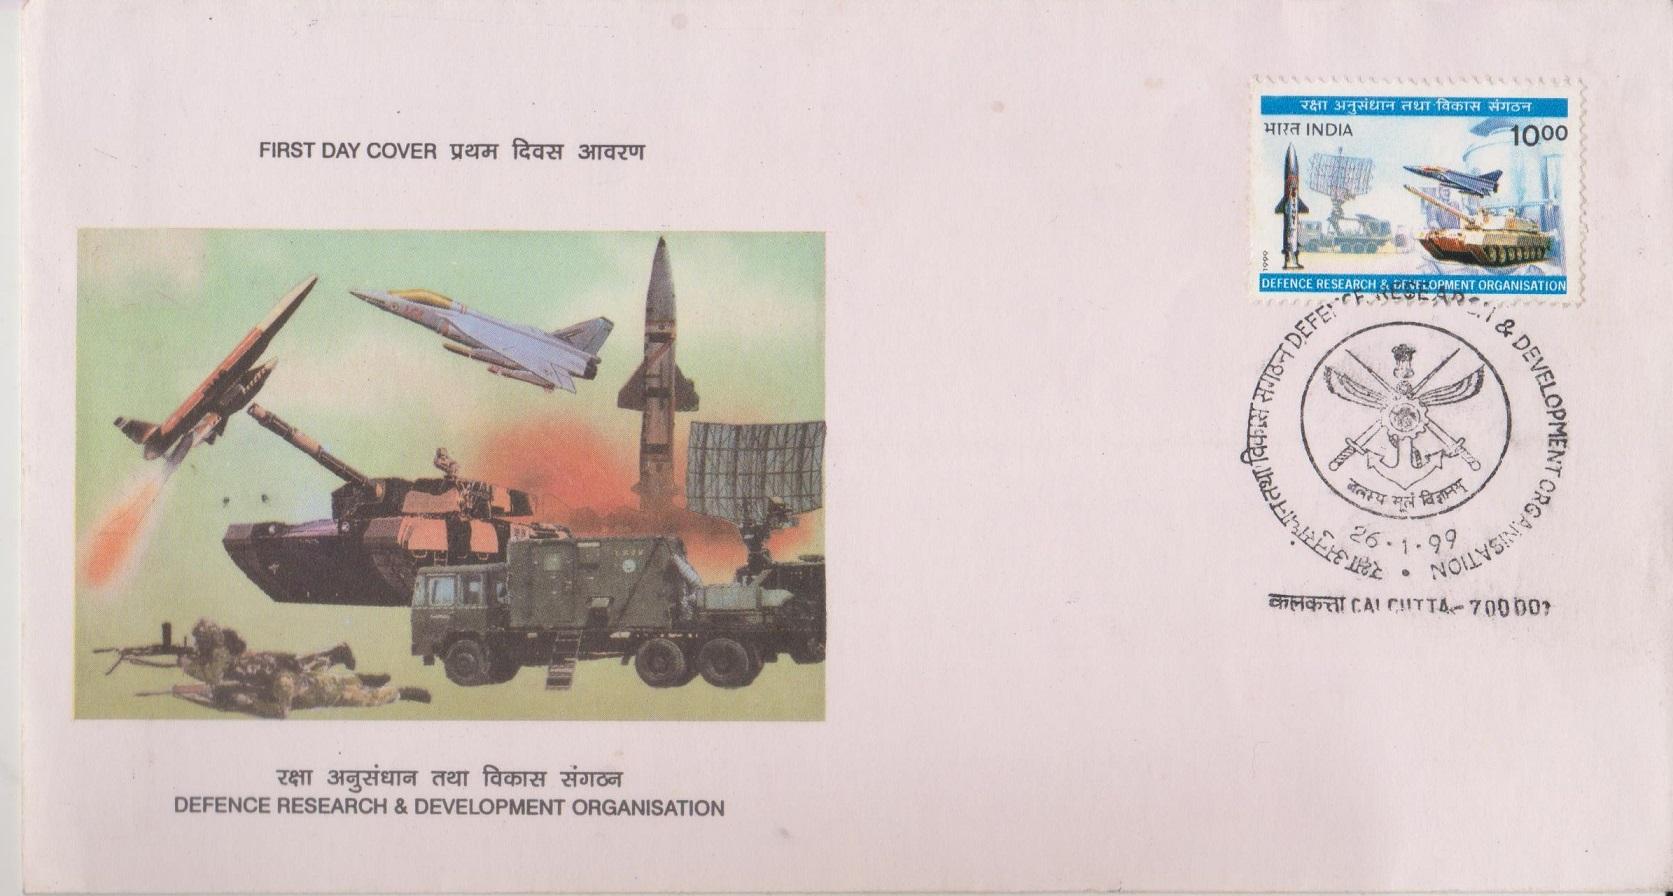 I.C.A., PTA, 'Prithvi' Missile, Tank 'Arjun' & 'Indra' Radar